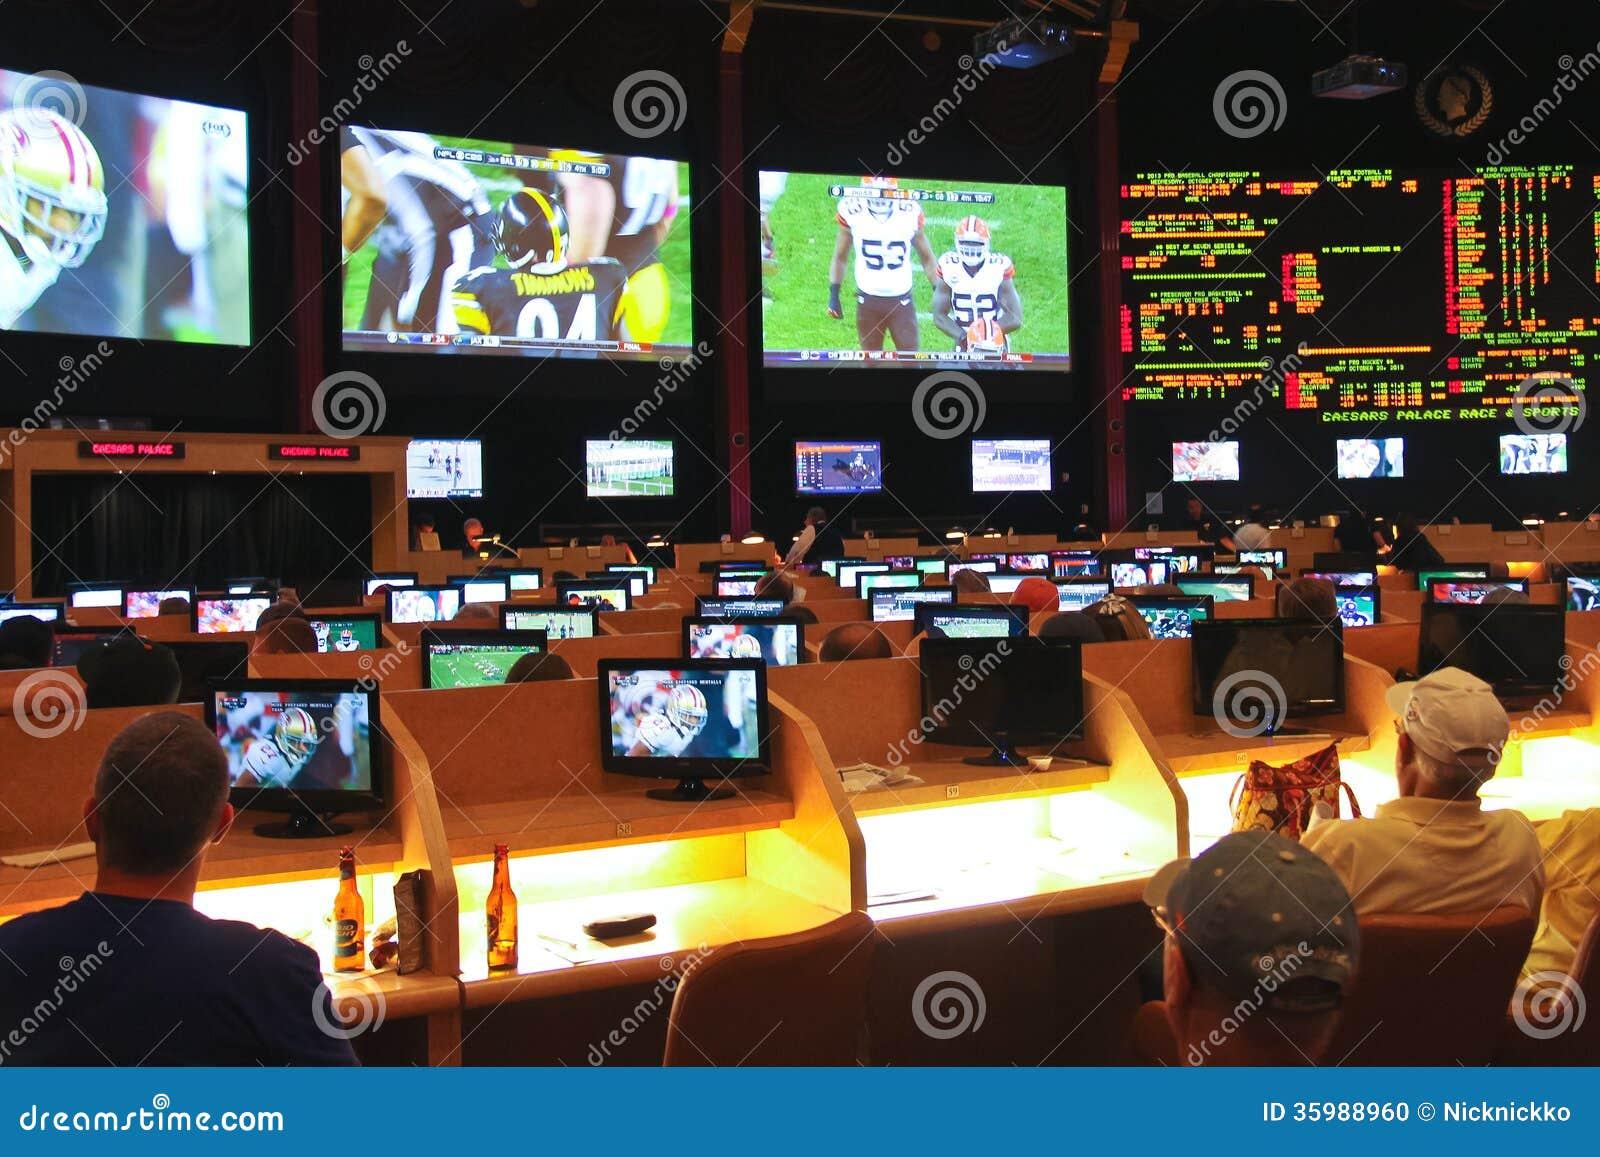 caesars palace online casino book of rar online spielen